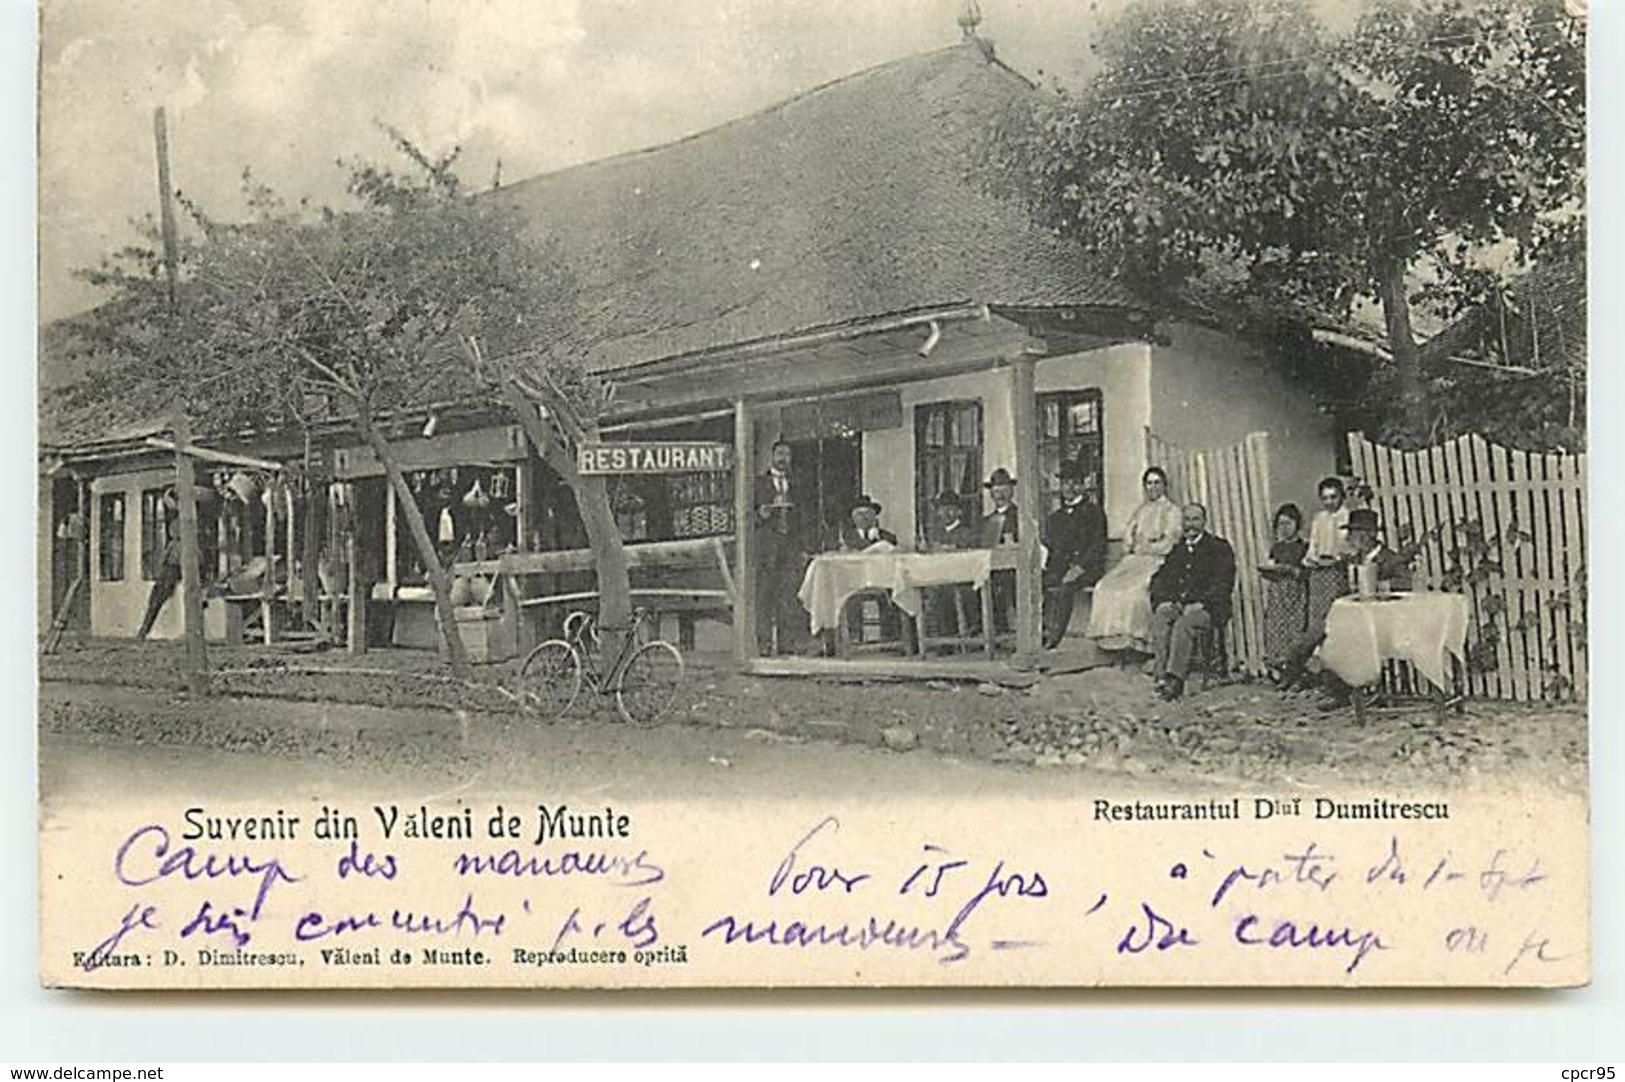 Roumanie - N°60901 - Suvenir Din Väleni De Munte - Restaurantul Dlui Dumitrescu - Roumanie